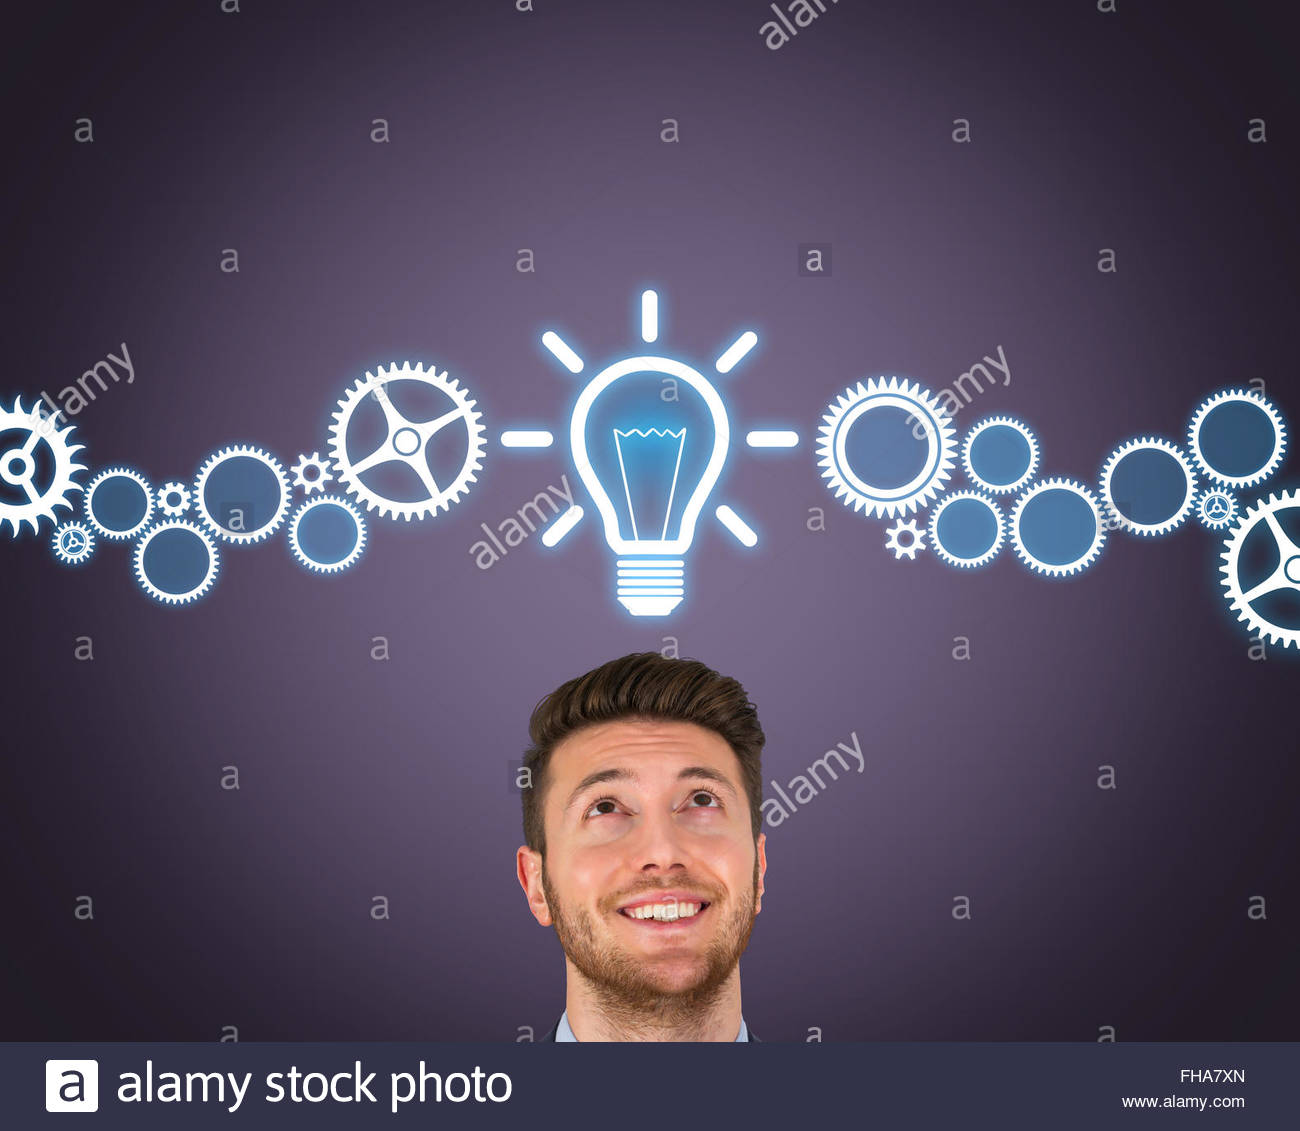 Nueva idea sobre cabeza humana Imagen De Stock